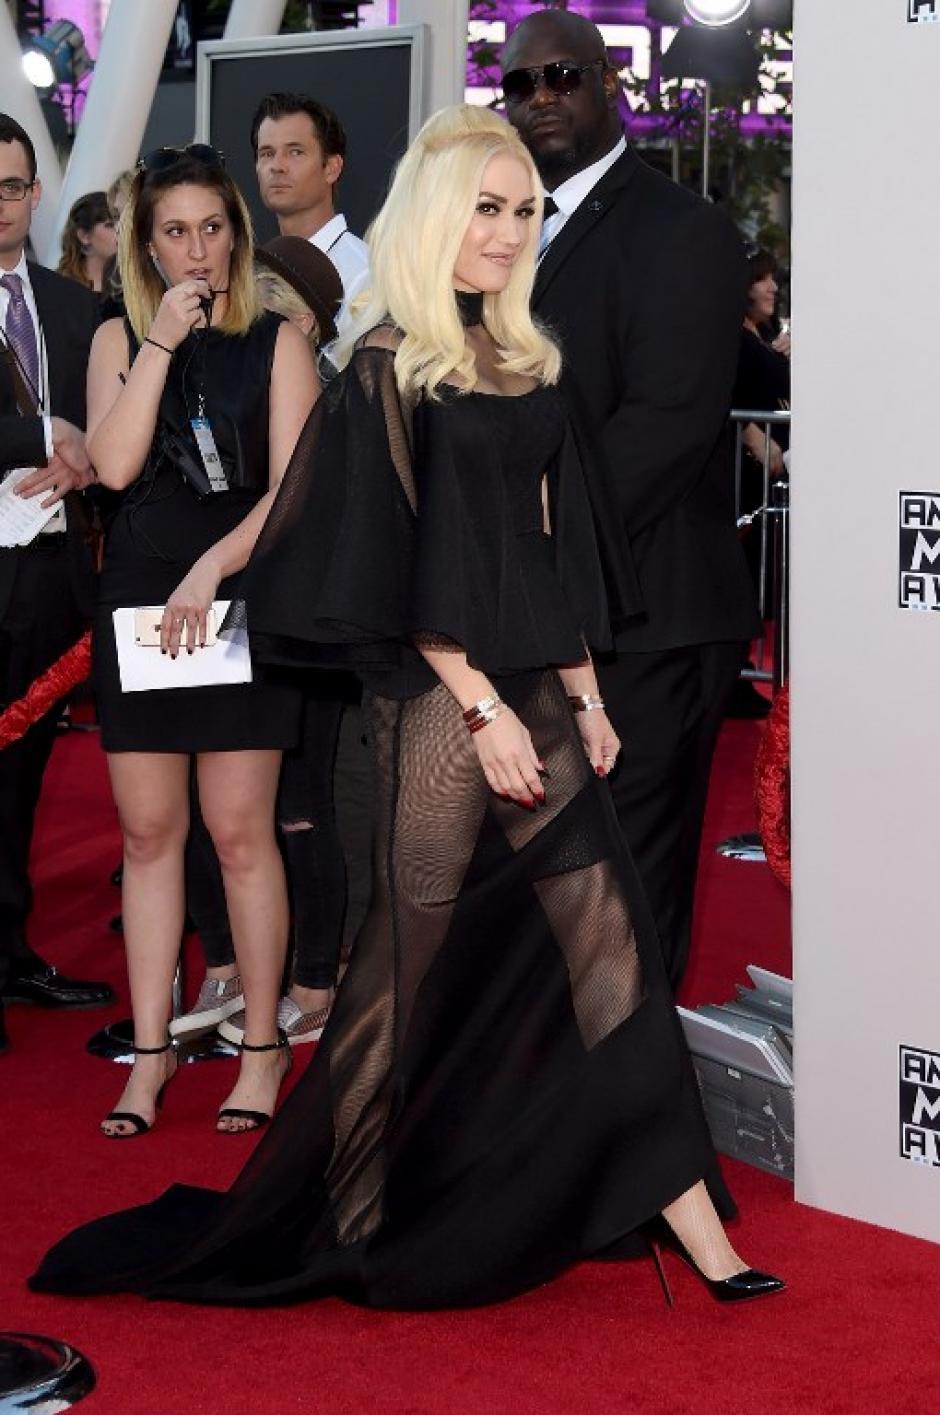 Gwen Stefani se luce en la alfombra de los American Music Awards 2015. (Foto: Jason Merritt / AFP)